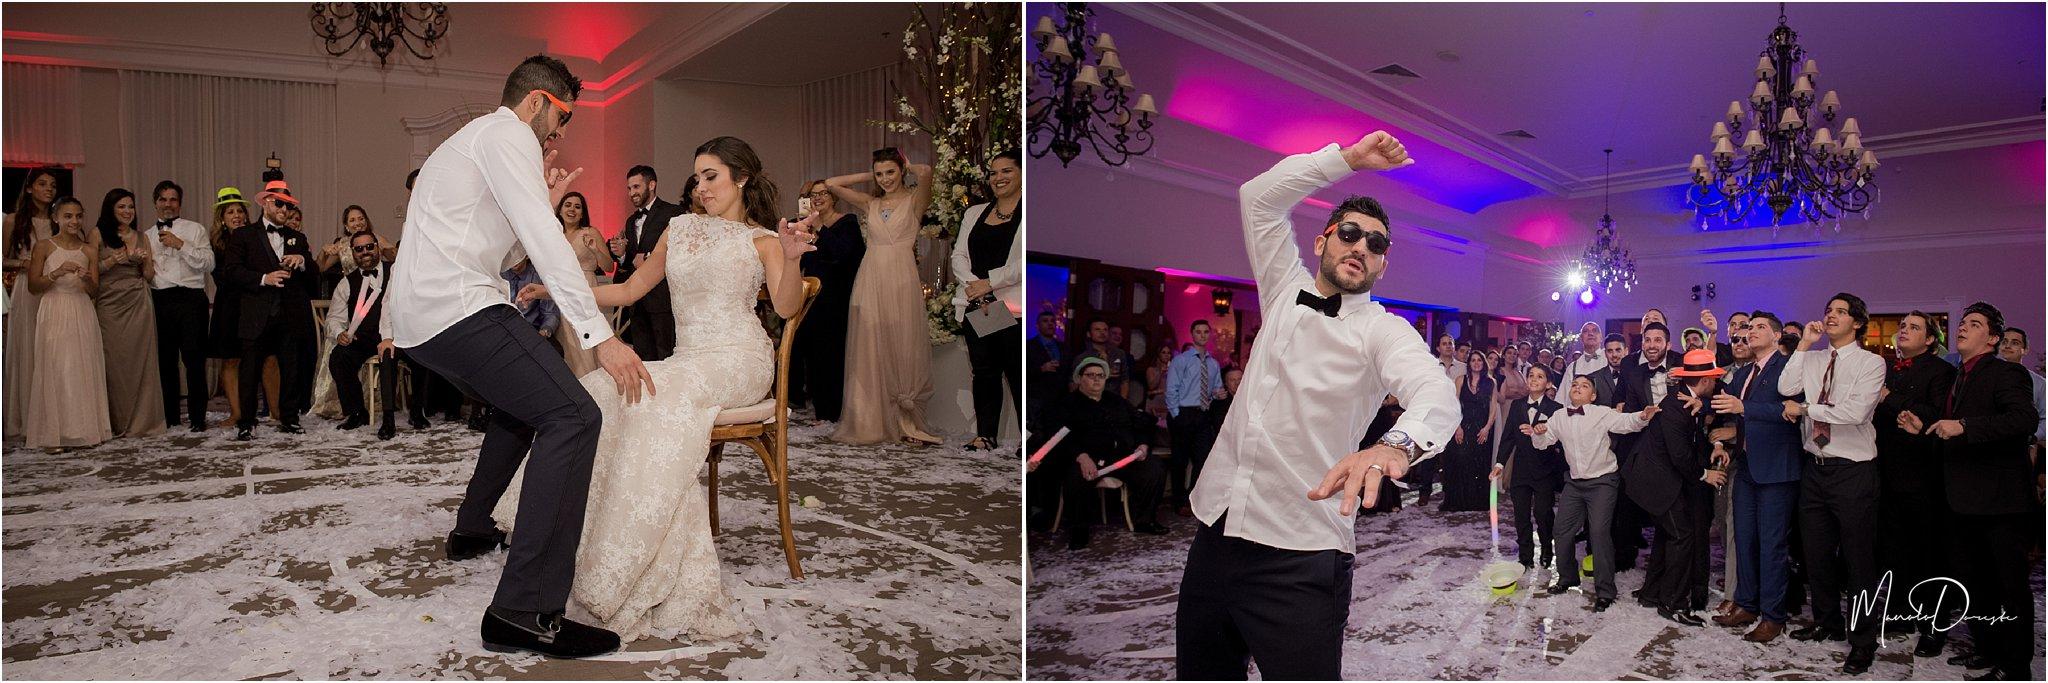 00948_ManoloDoreste_InFocusStudios_Wedding_Family_Photography_Miami_MiamiPhotographer.jpg